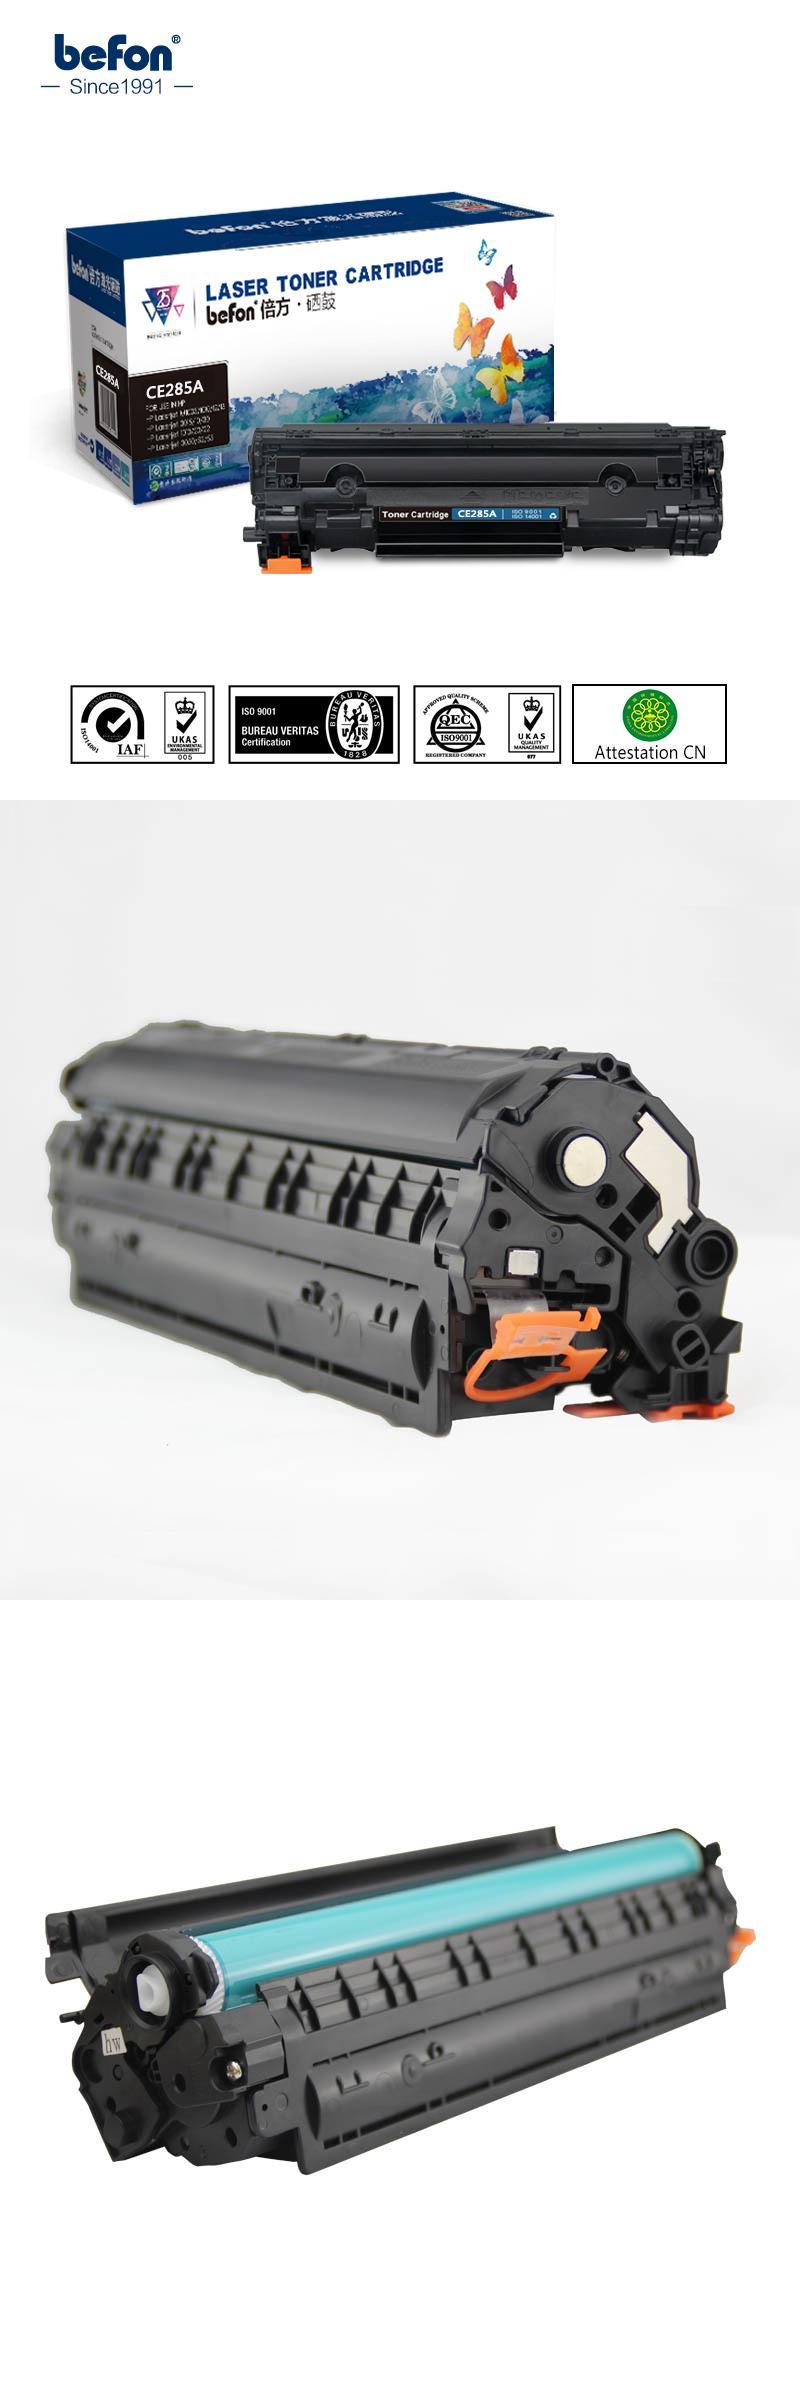 Visit To Buy Compatible For Hp Ce285a 85a 285a Toner Cartridge For Hp P1102 P1102w Laserjet Pro M1130 M1132 M1134 M1212 M12 Toner Cartridge Toner Cheap Toner